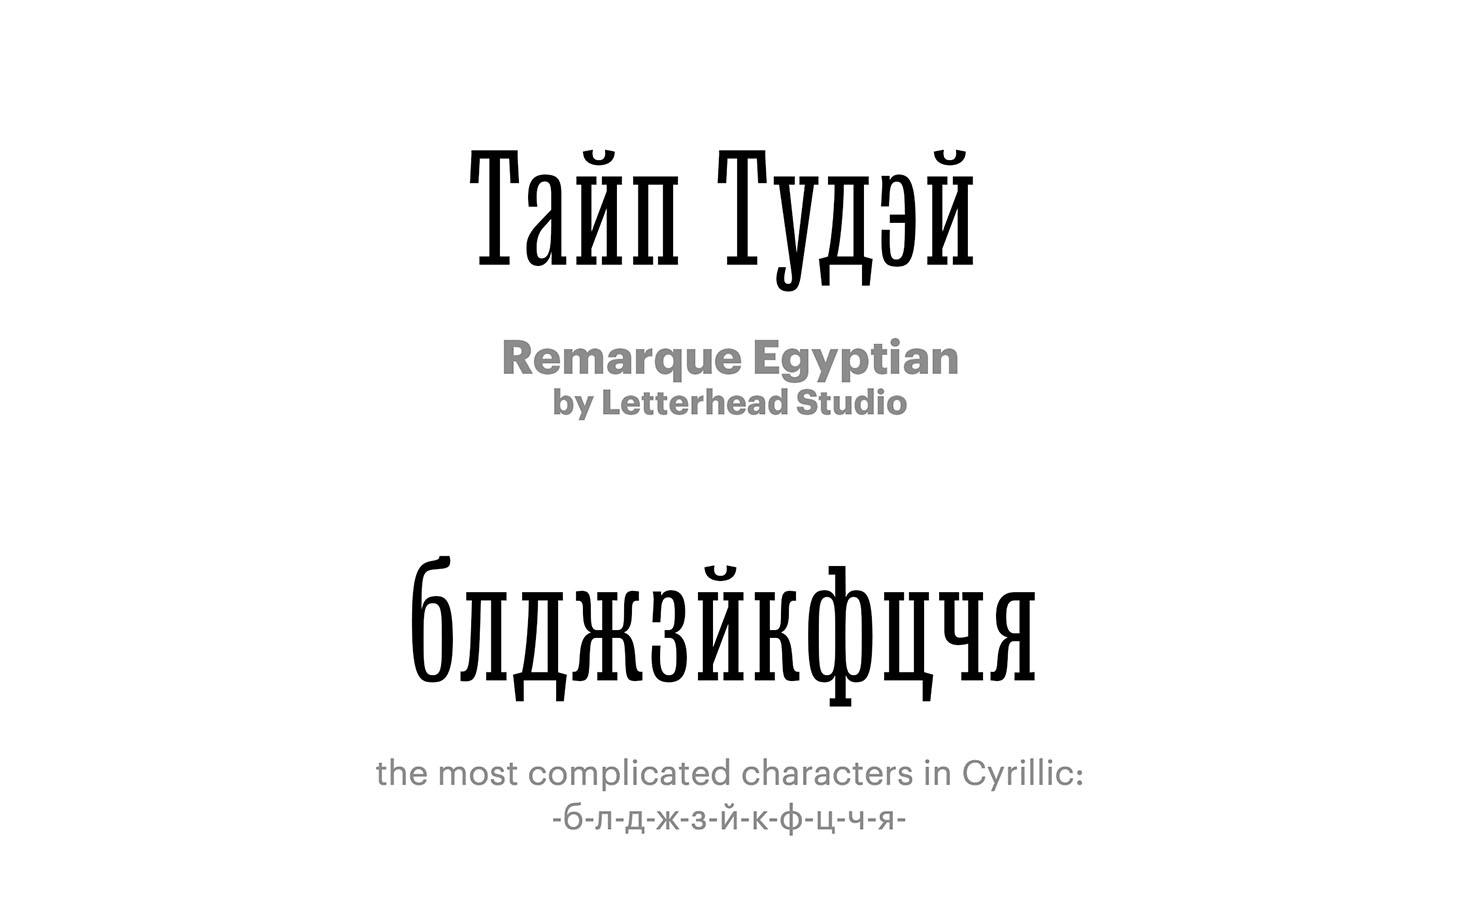 Remarque-Egyptian